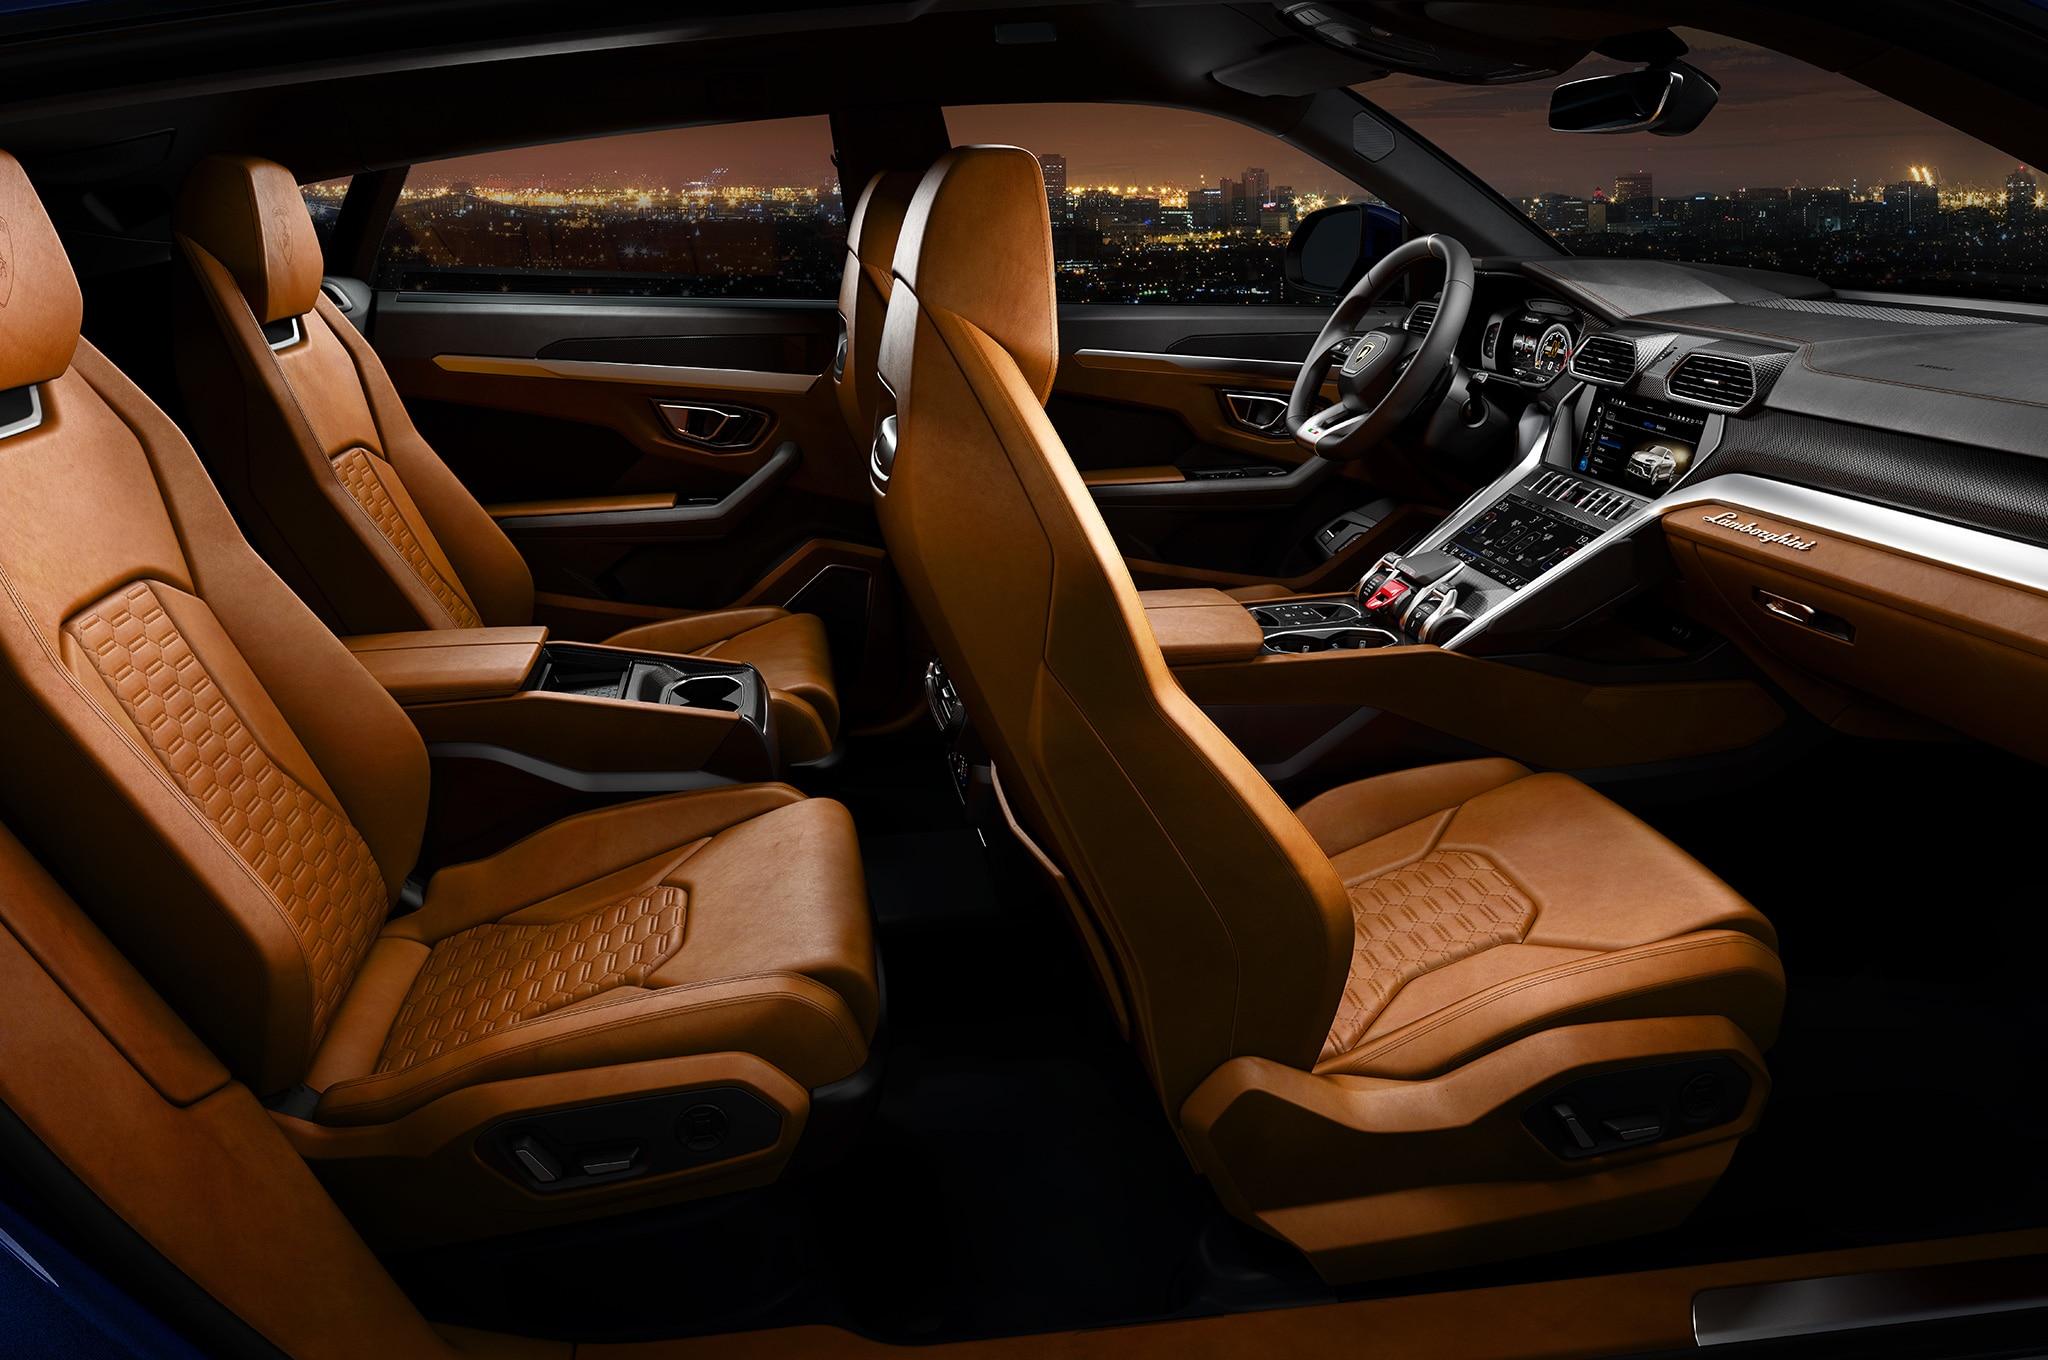 2019-Lamborghini-Urus-interior-from-side.jpg